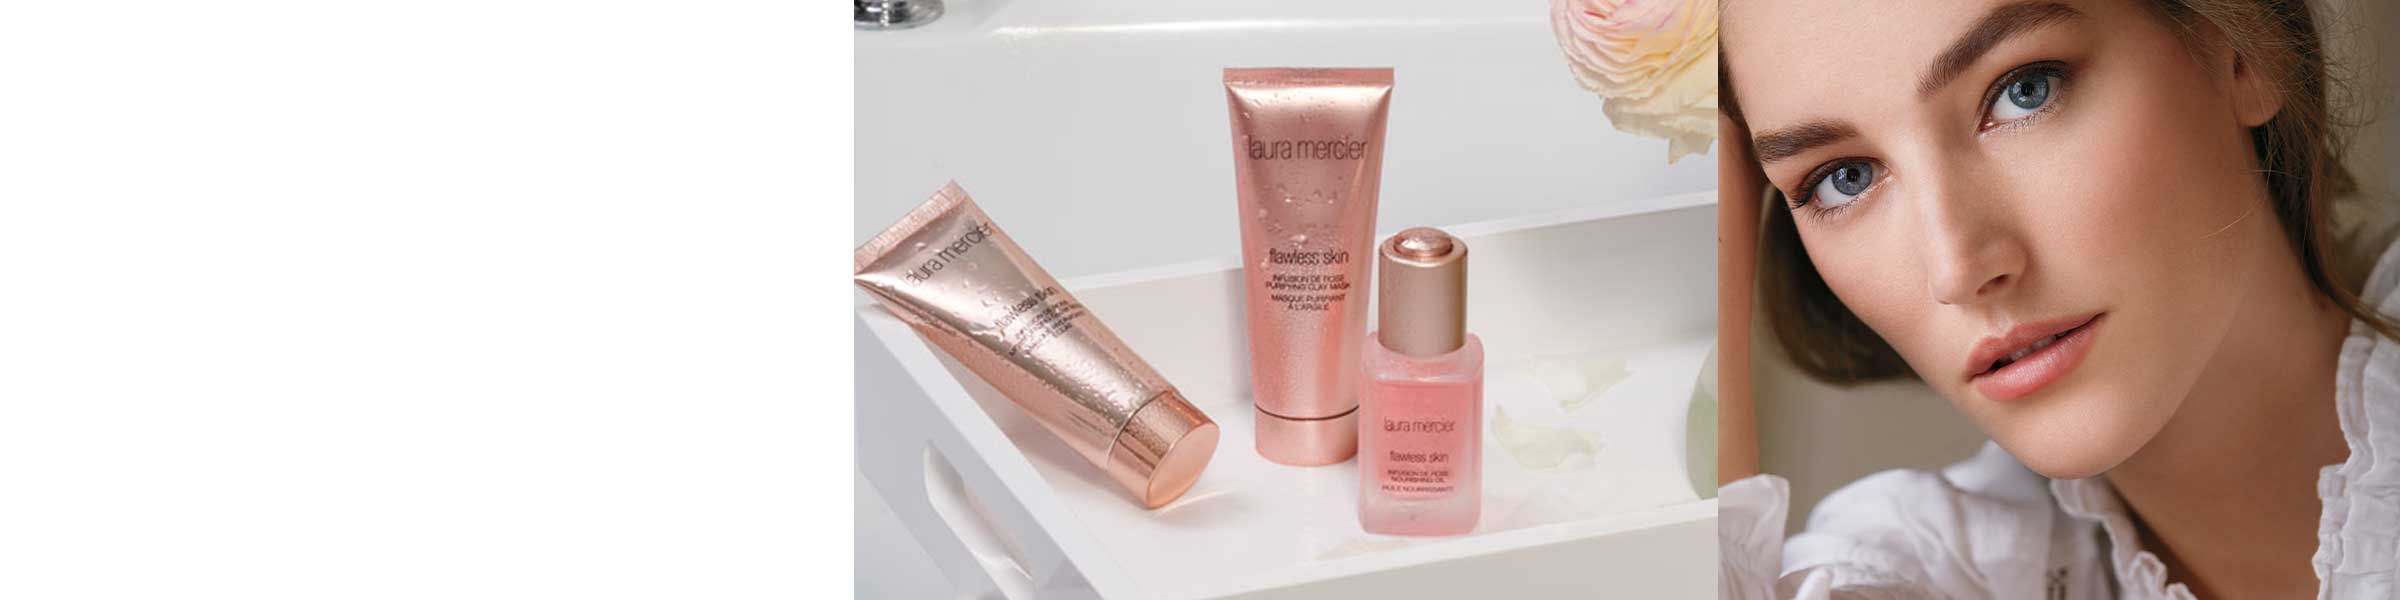 Flawless Skin Care